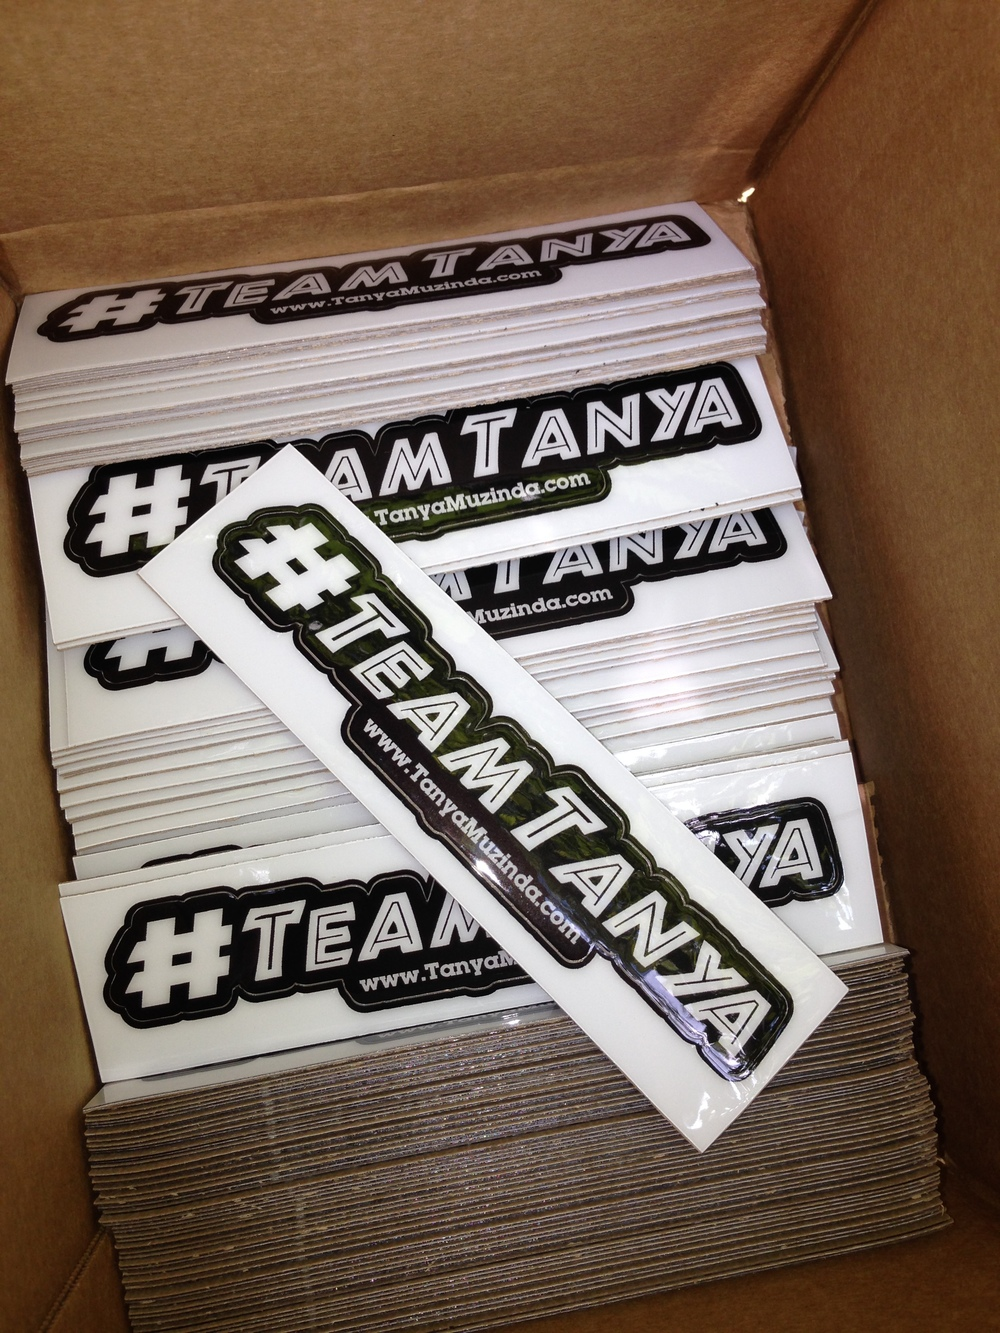 #TEAMTANYA stickers